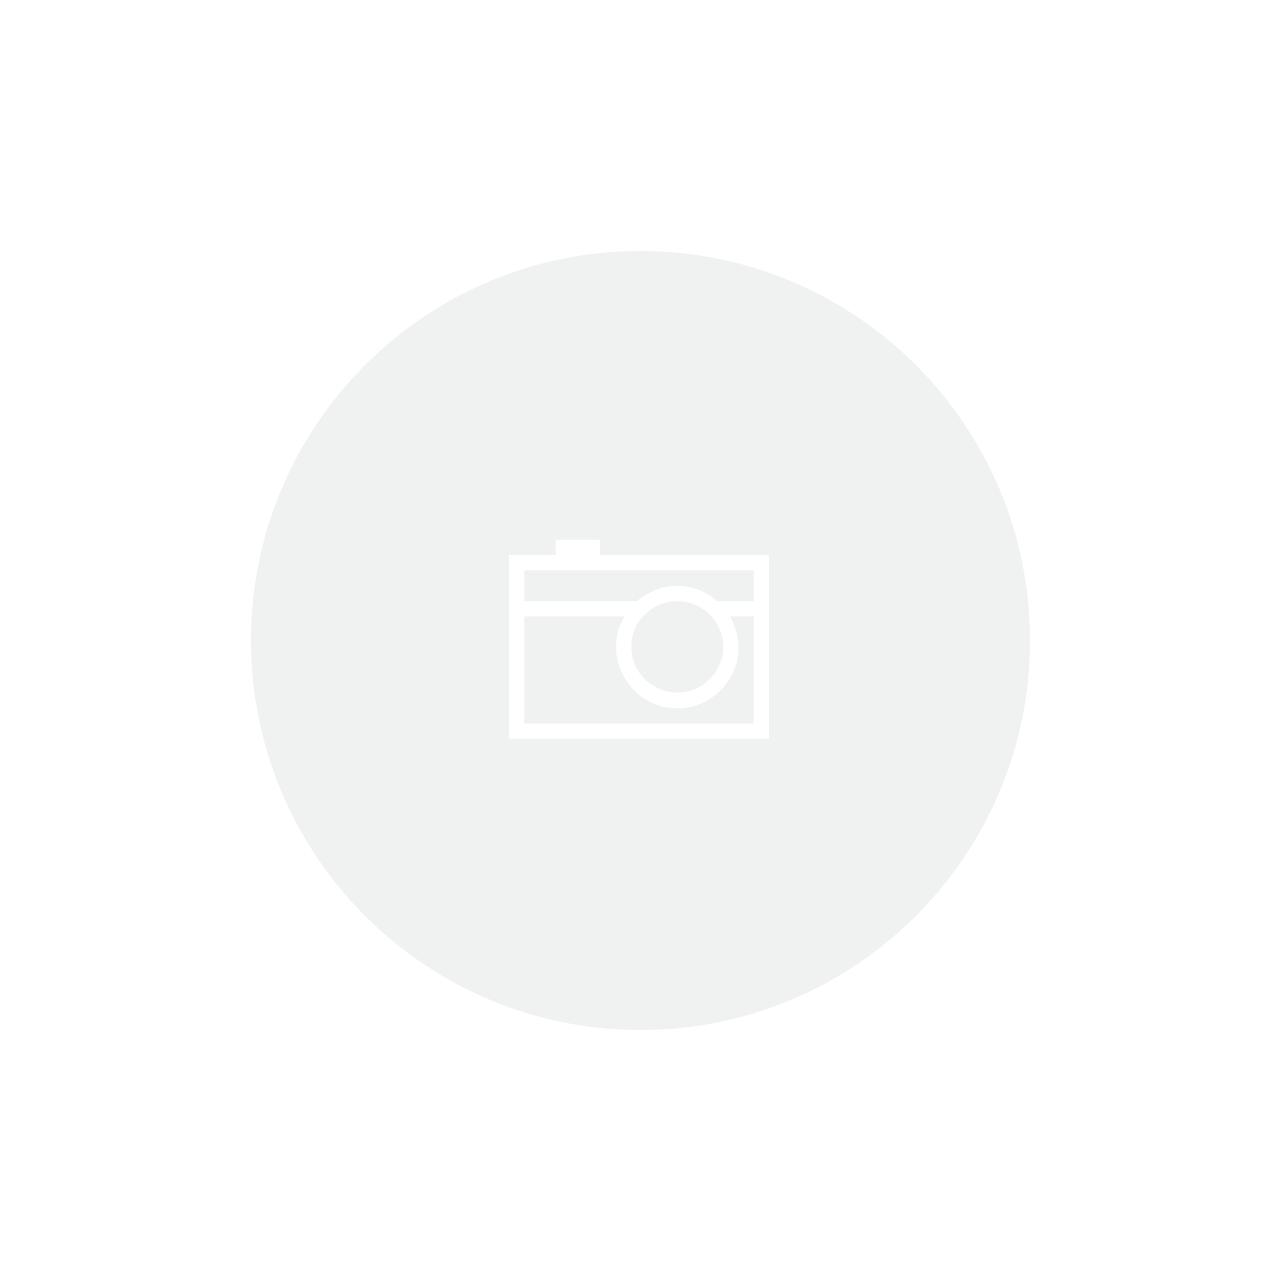 Jogo de Cama s. King Conf. Basic Premium cor Branco